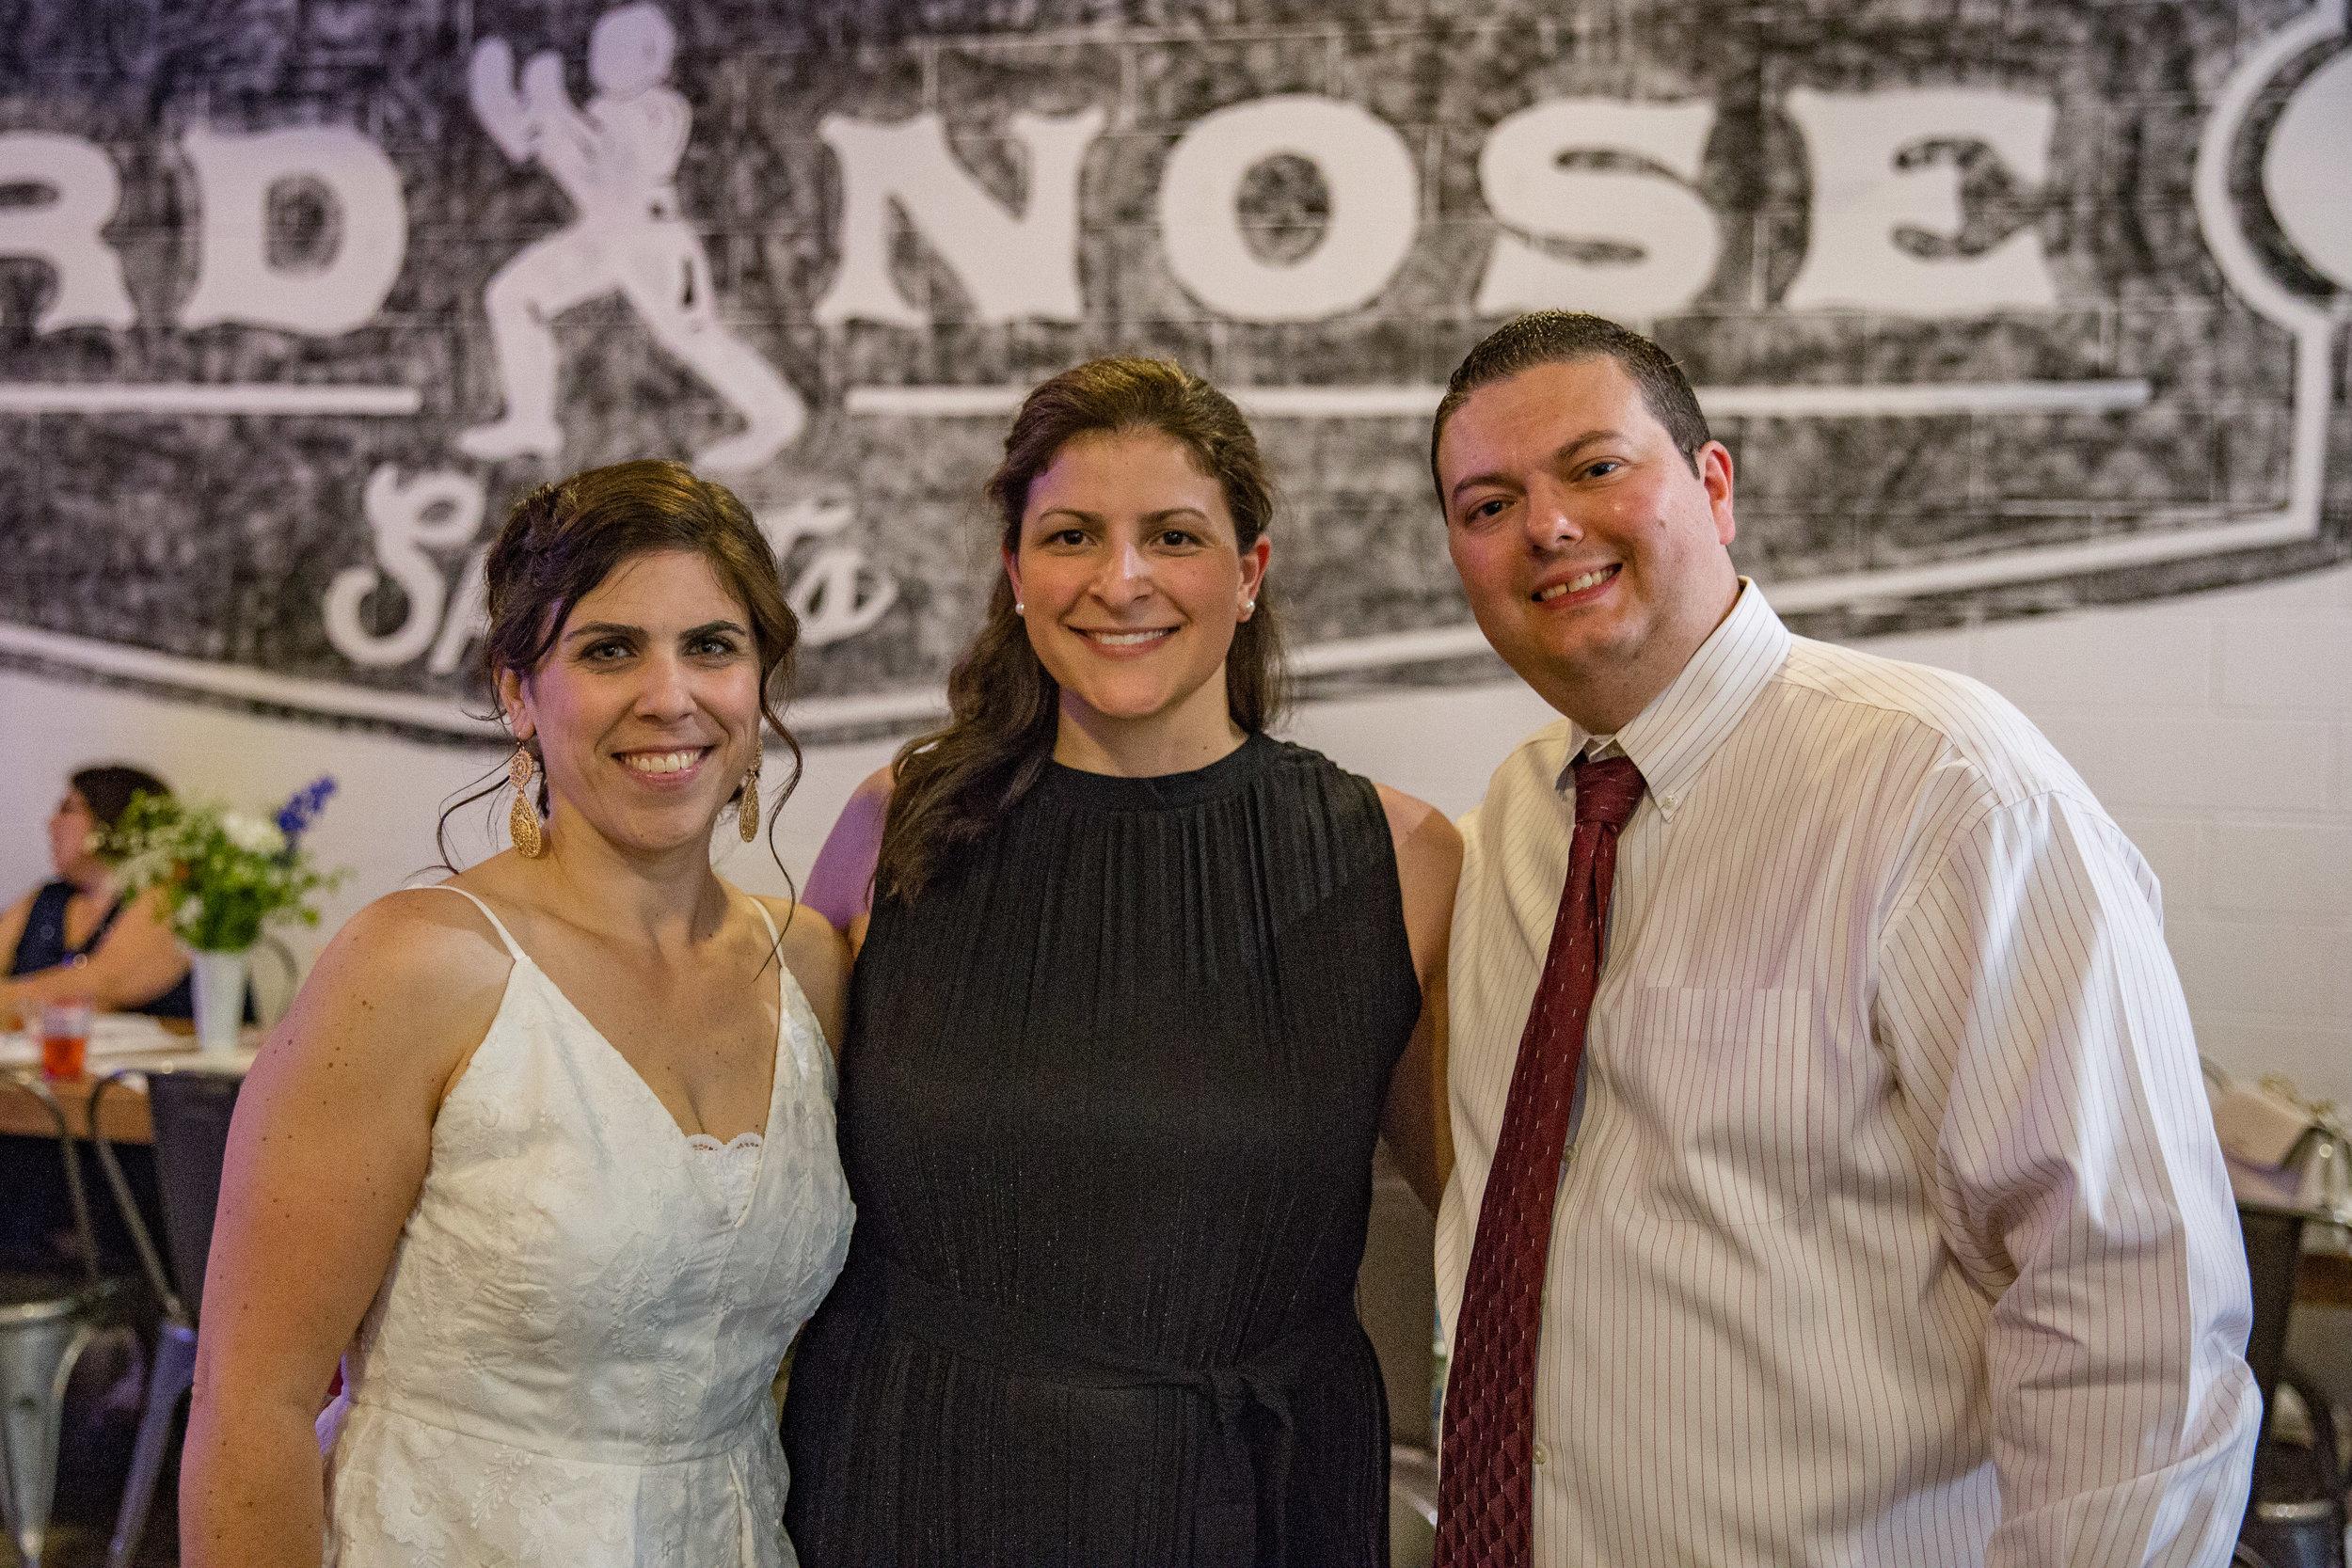 Natalie and Dallas Mooney Wedding 6-8-19_Tania Watt Photography-413.jpg